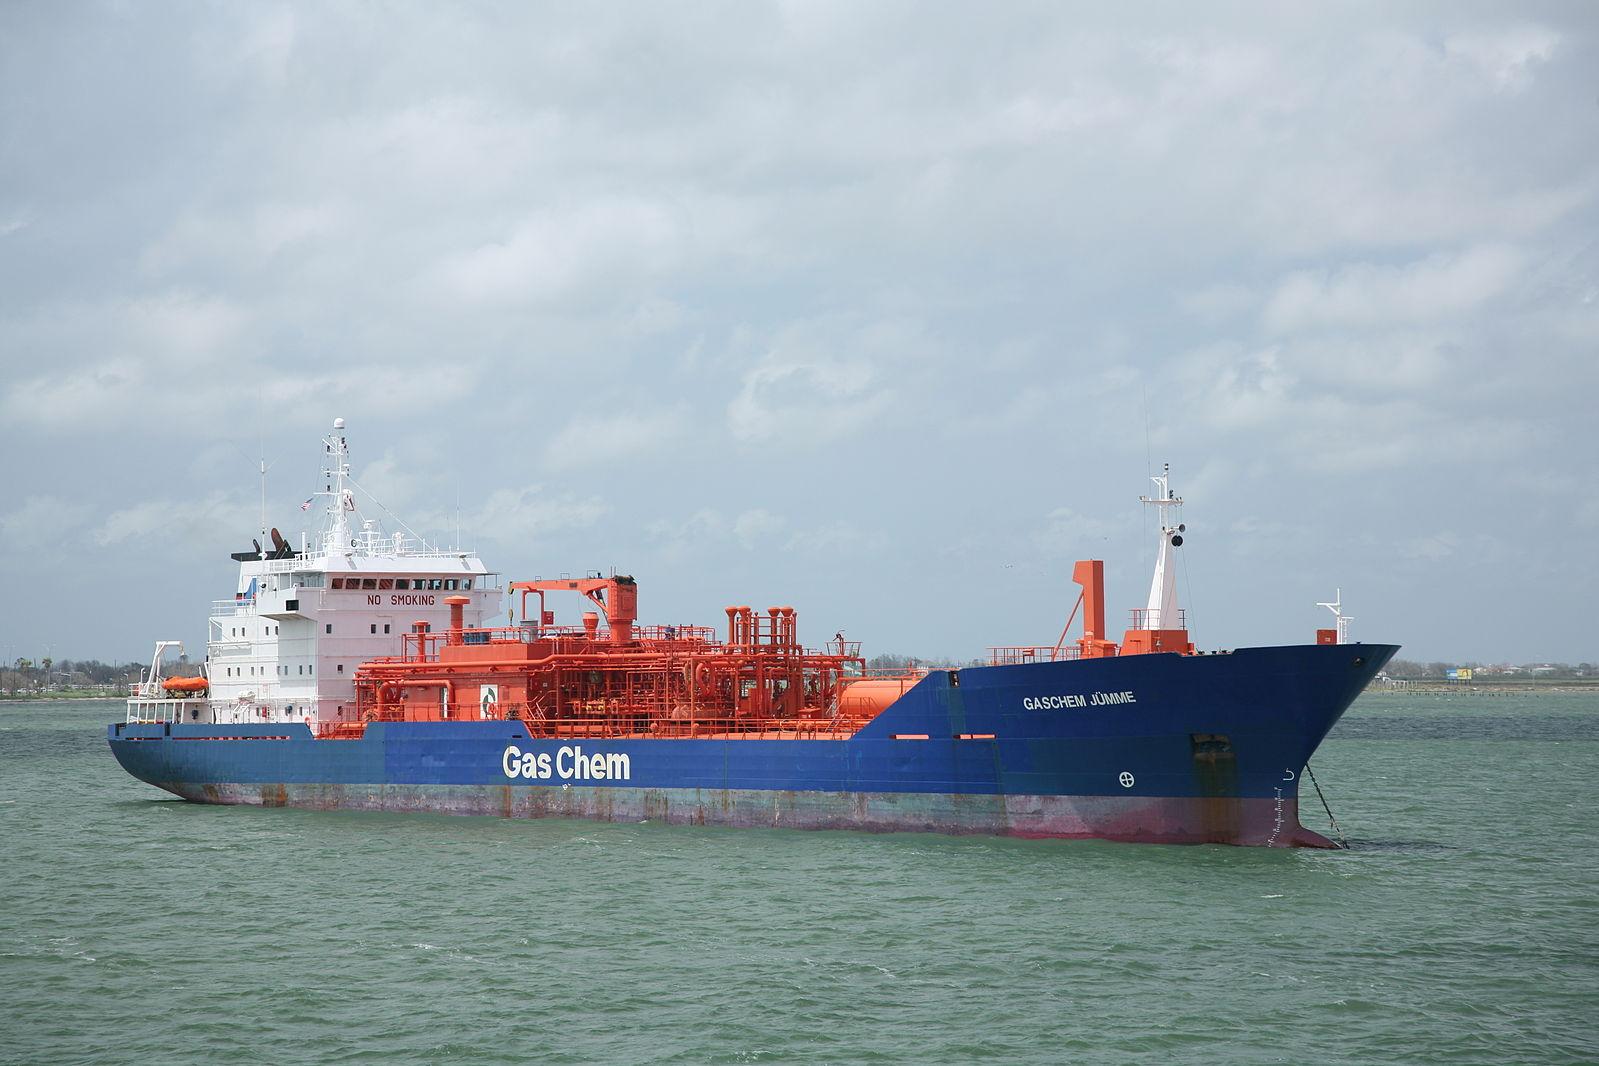 Image - Ship sailing in the sea